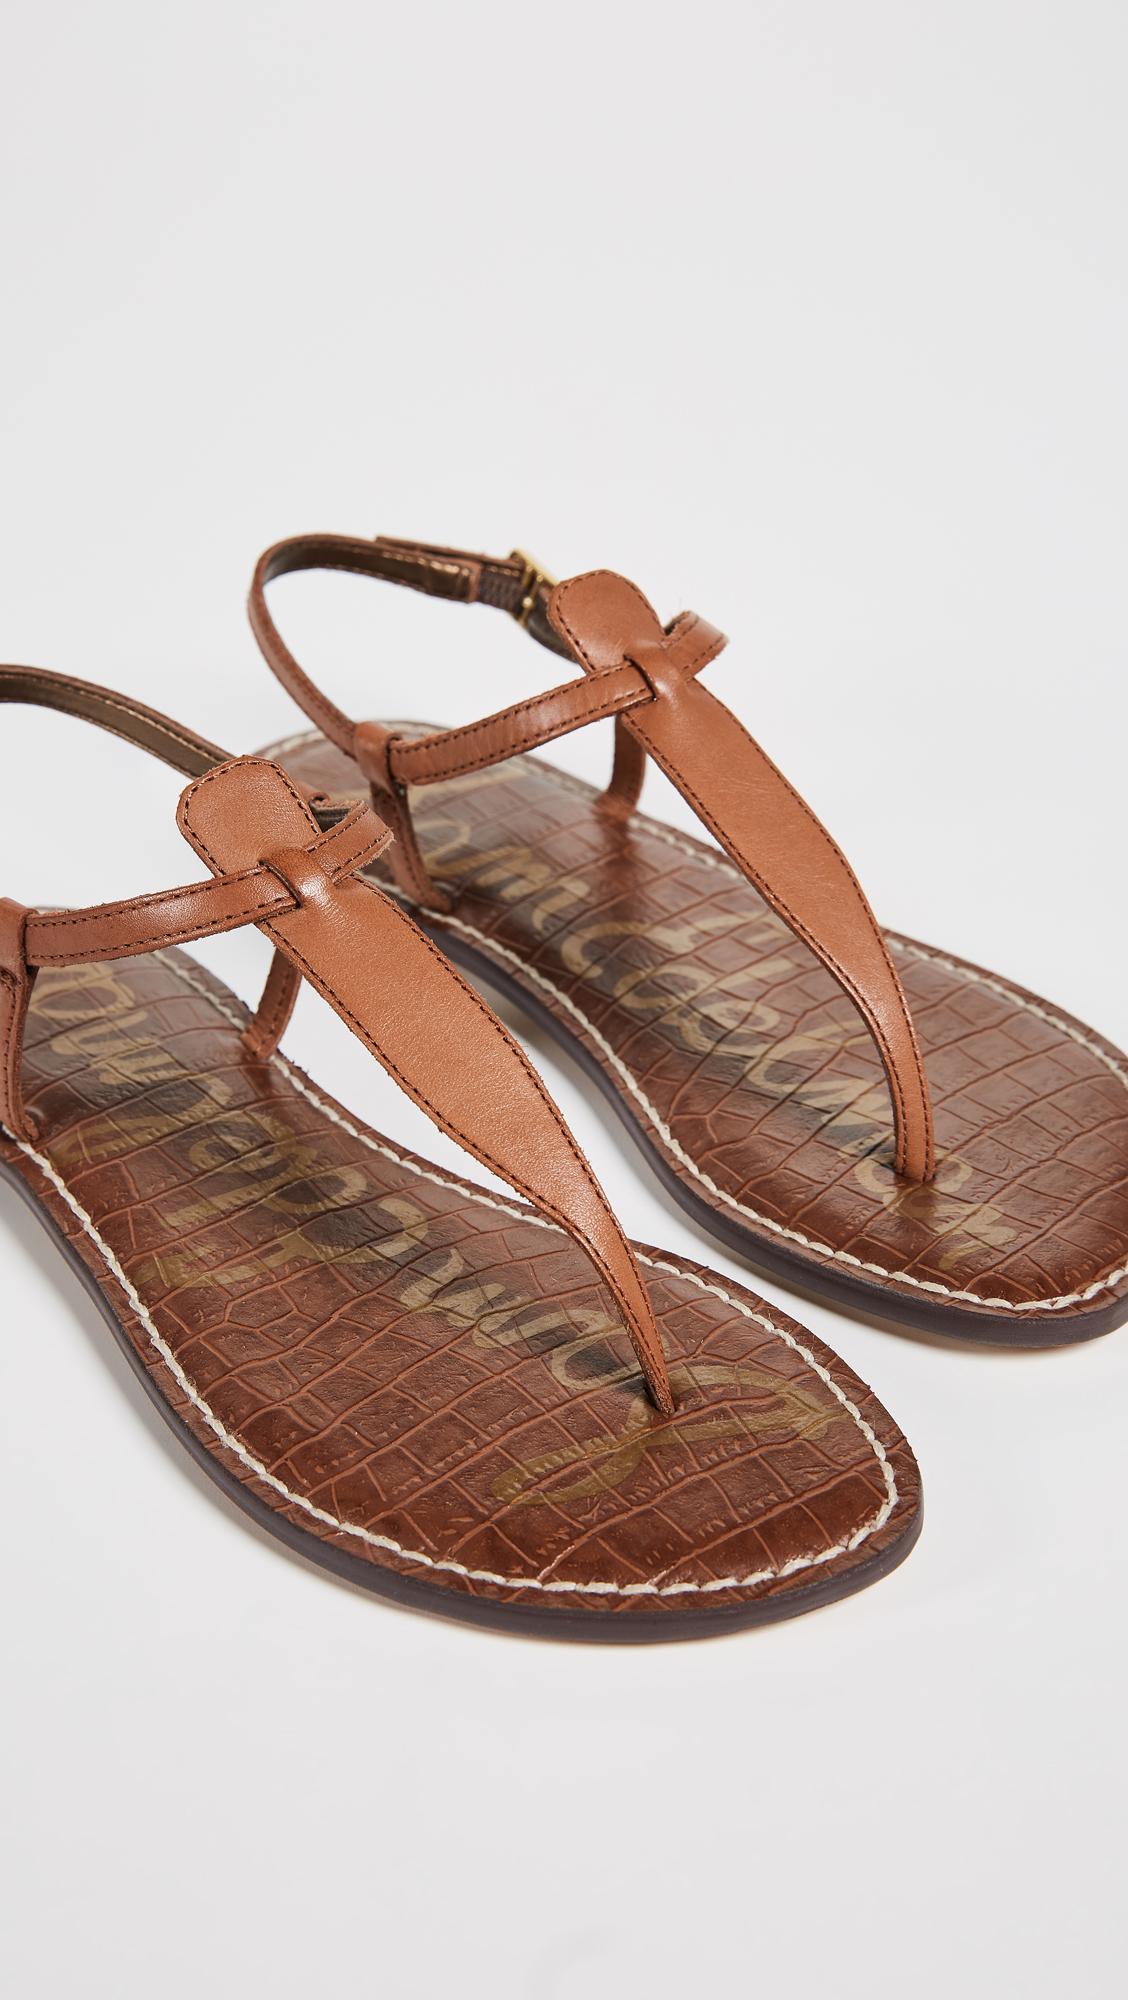 7c3b26acf Sam Edelman Gigi Flat Sandals